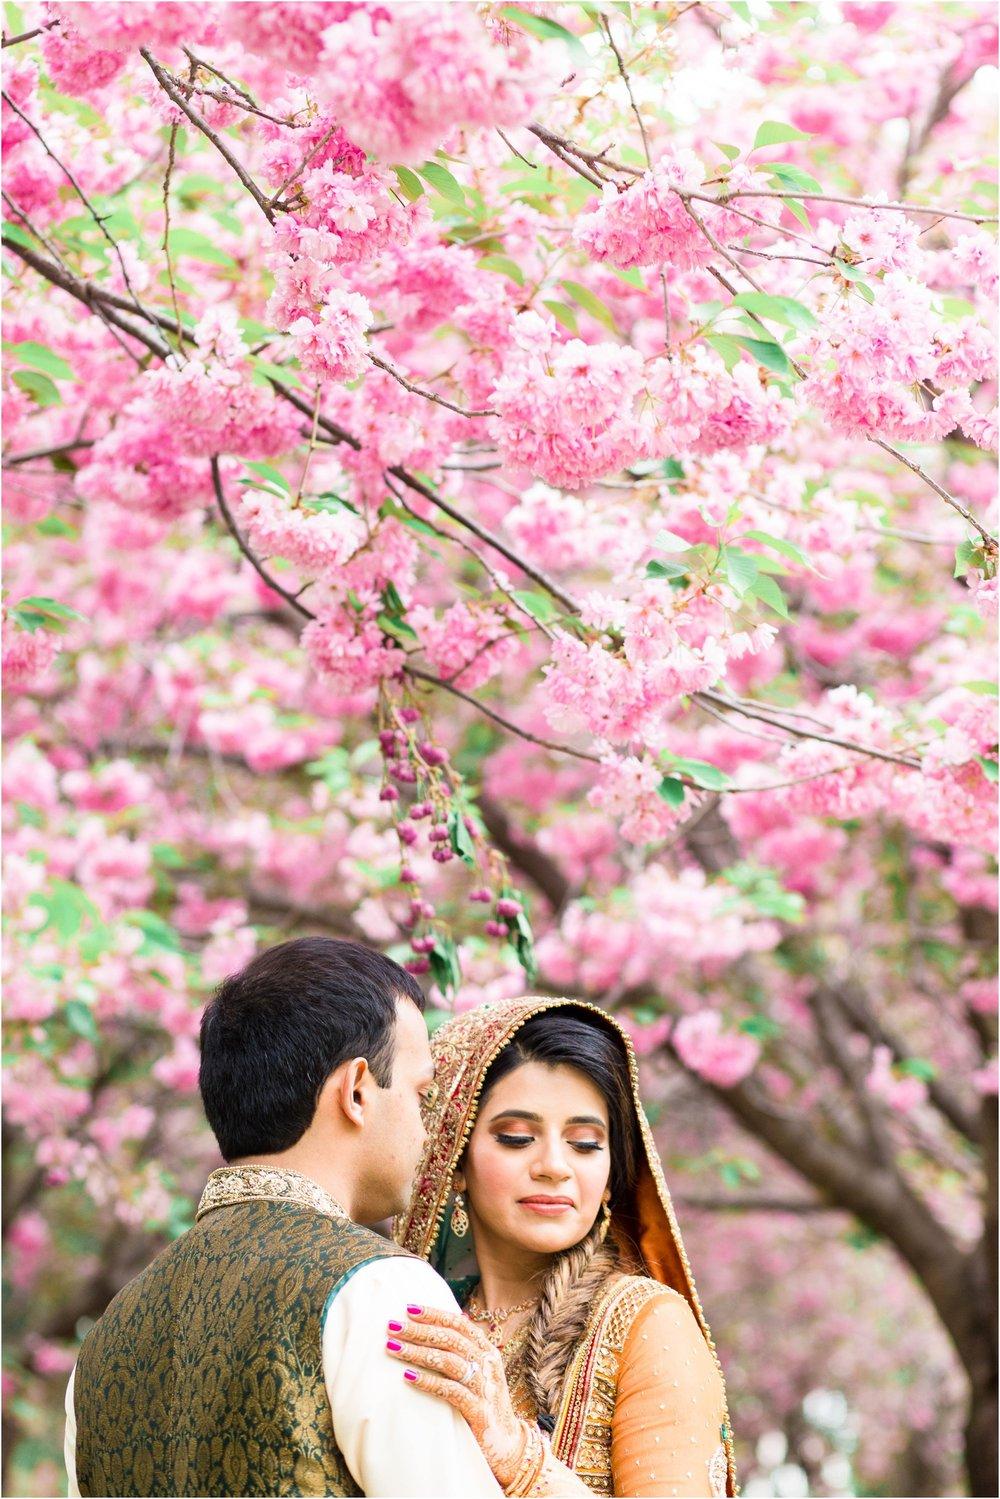 Best-of-2017-Weddings-Toronto-Mississauga-Brampton-Scarborough-GTA-Pakistani-Indian-Wedding-Engagement-Photographer-Photography_0036.jpg